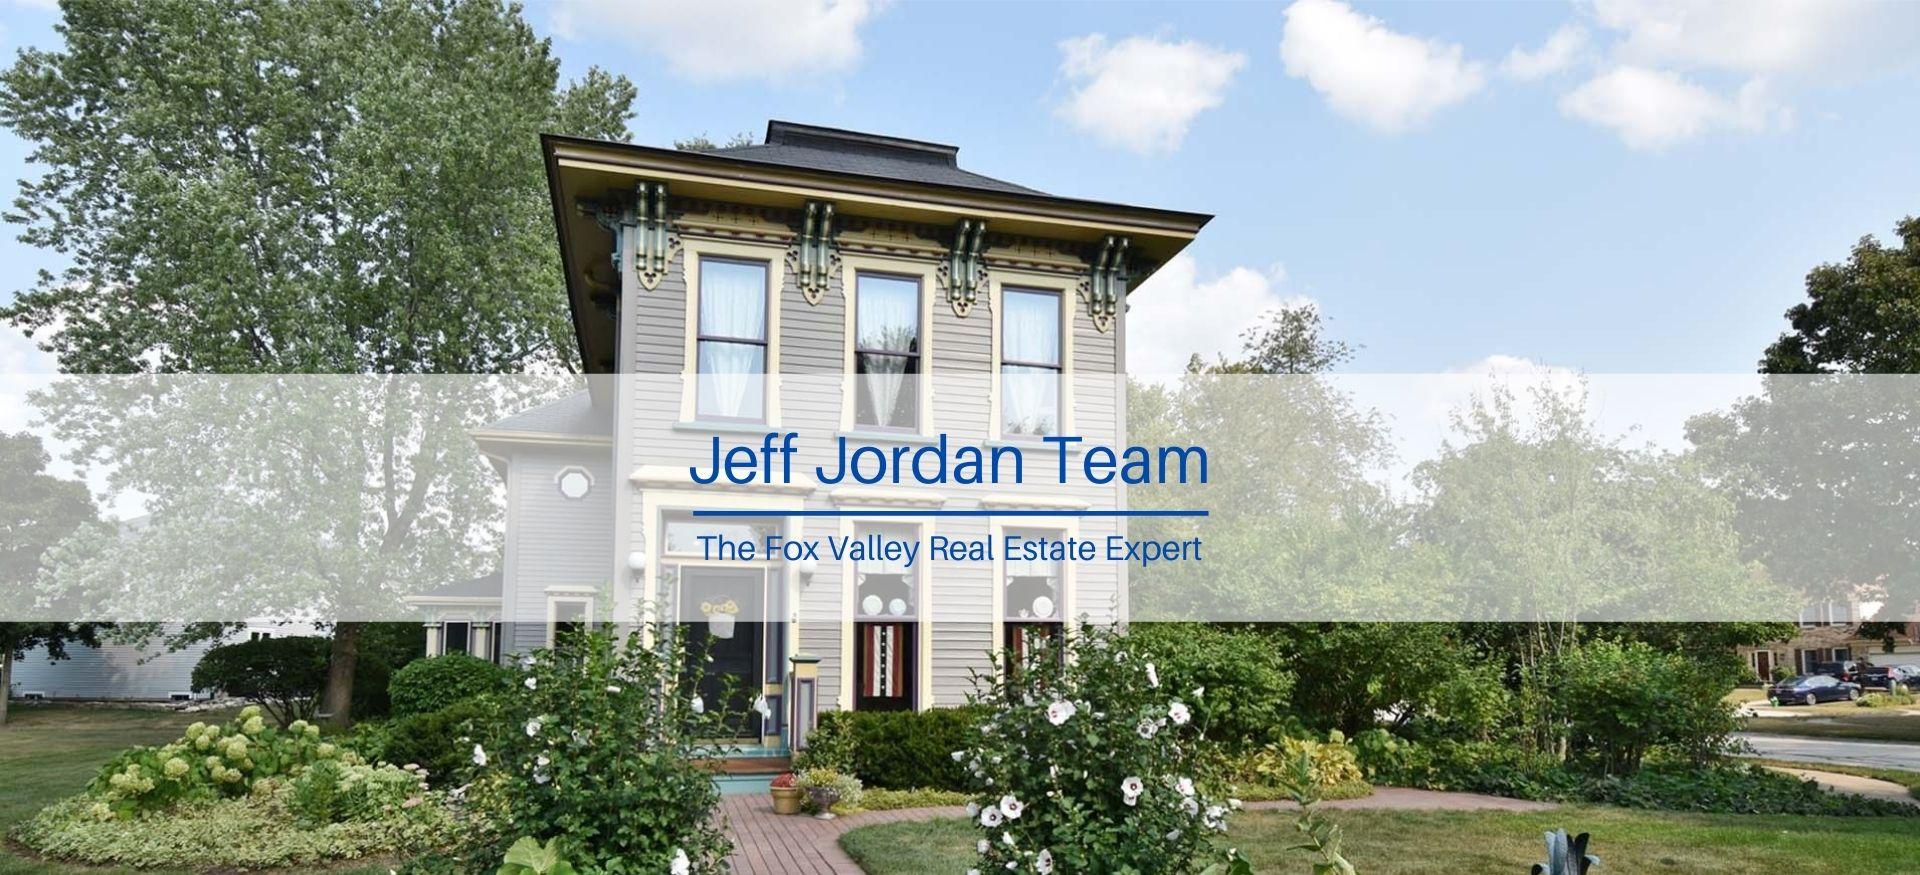 Jeff Jordan Team - Roberts Lane Batavia IL